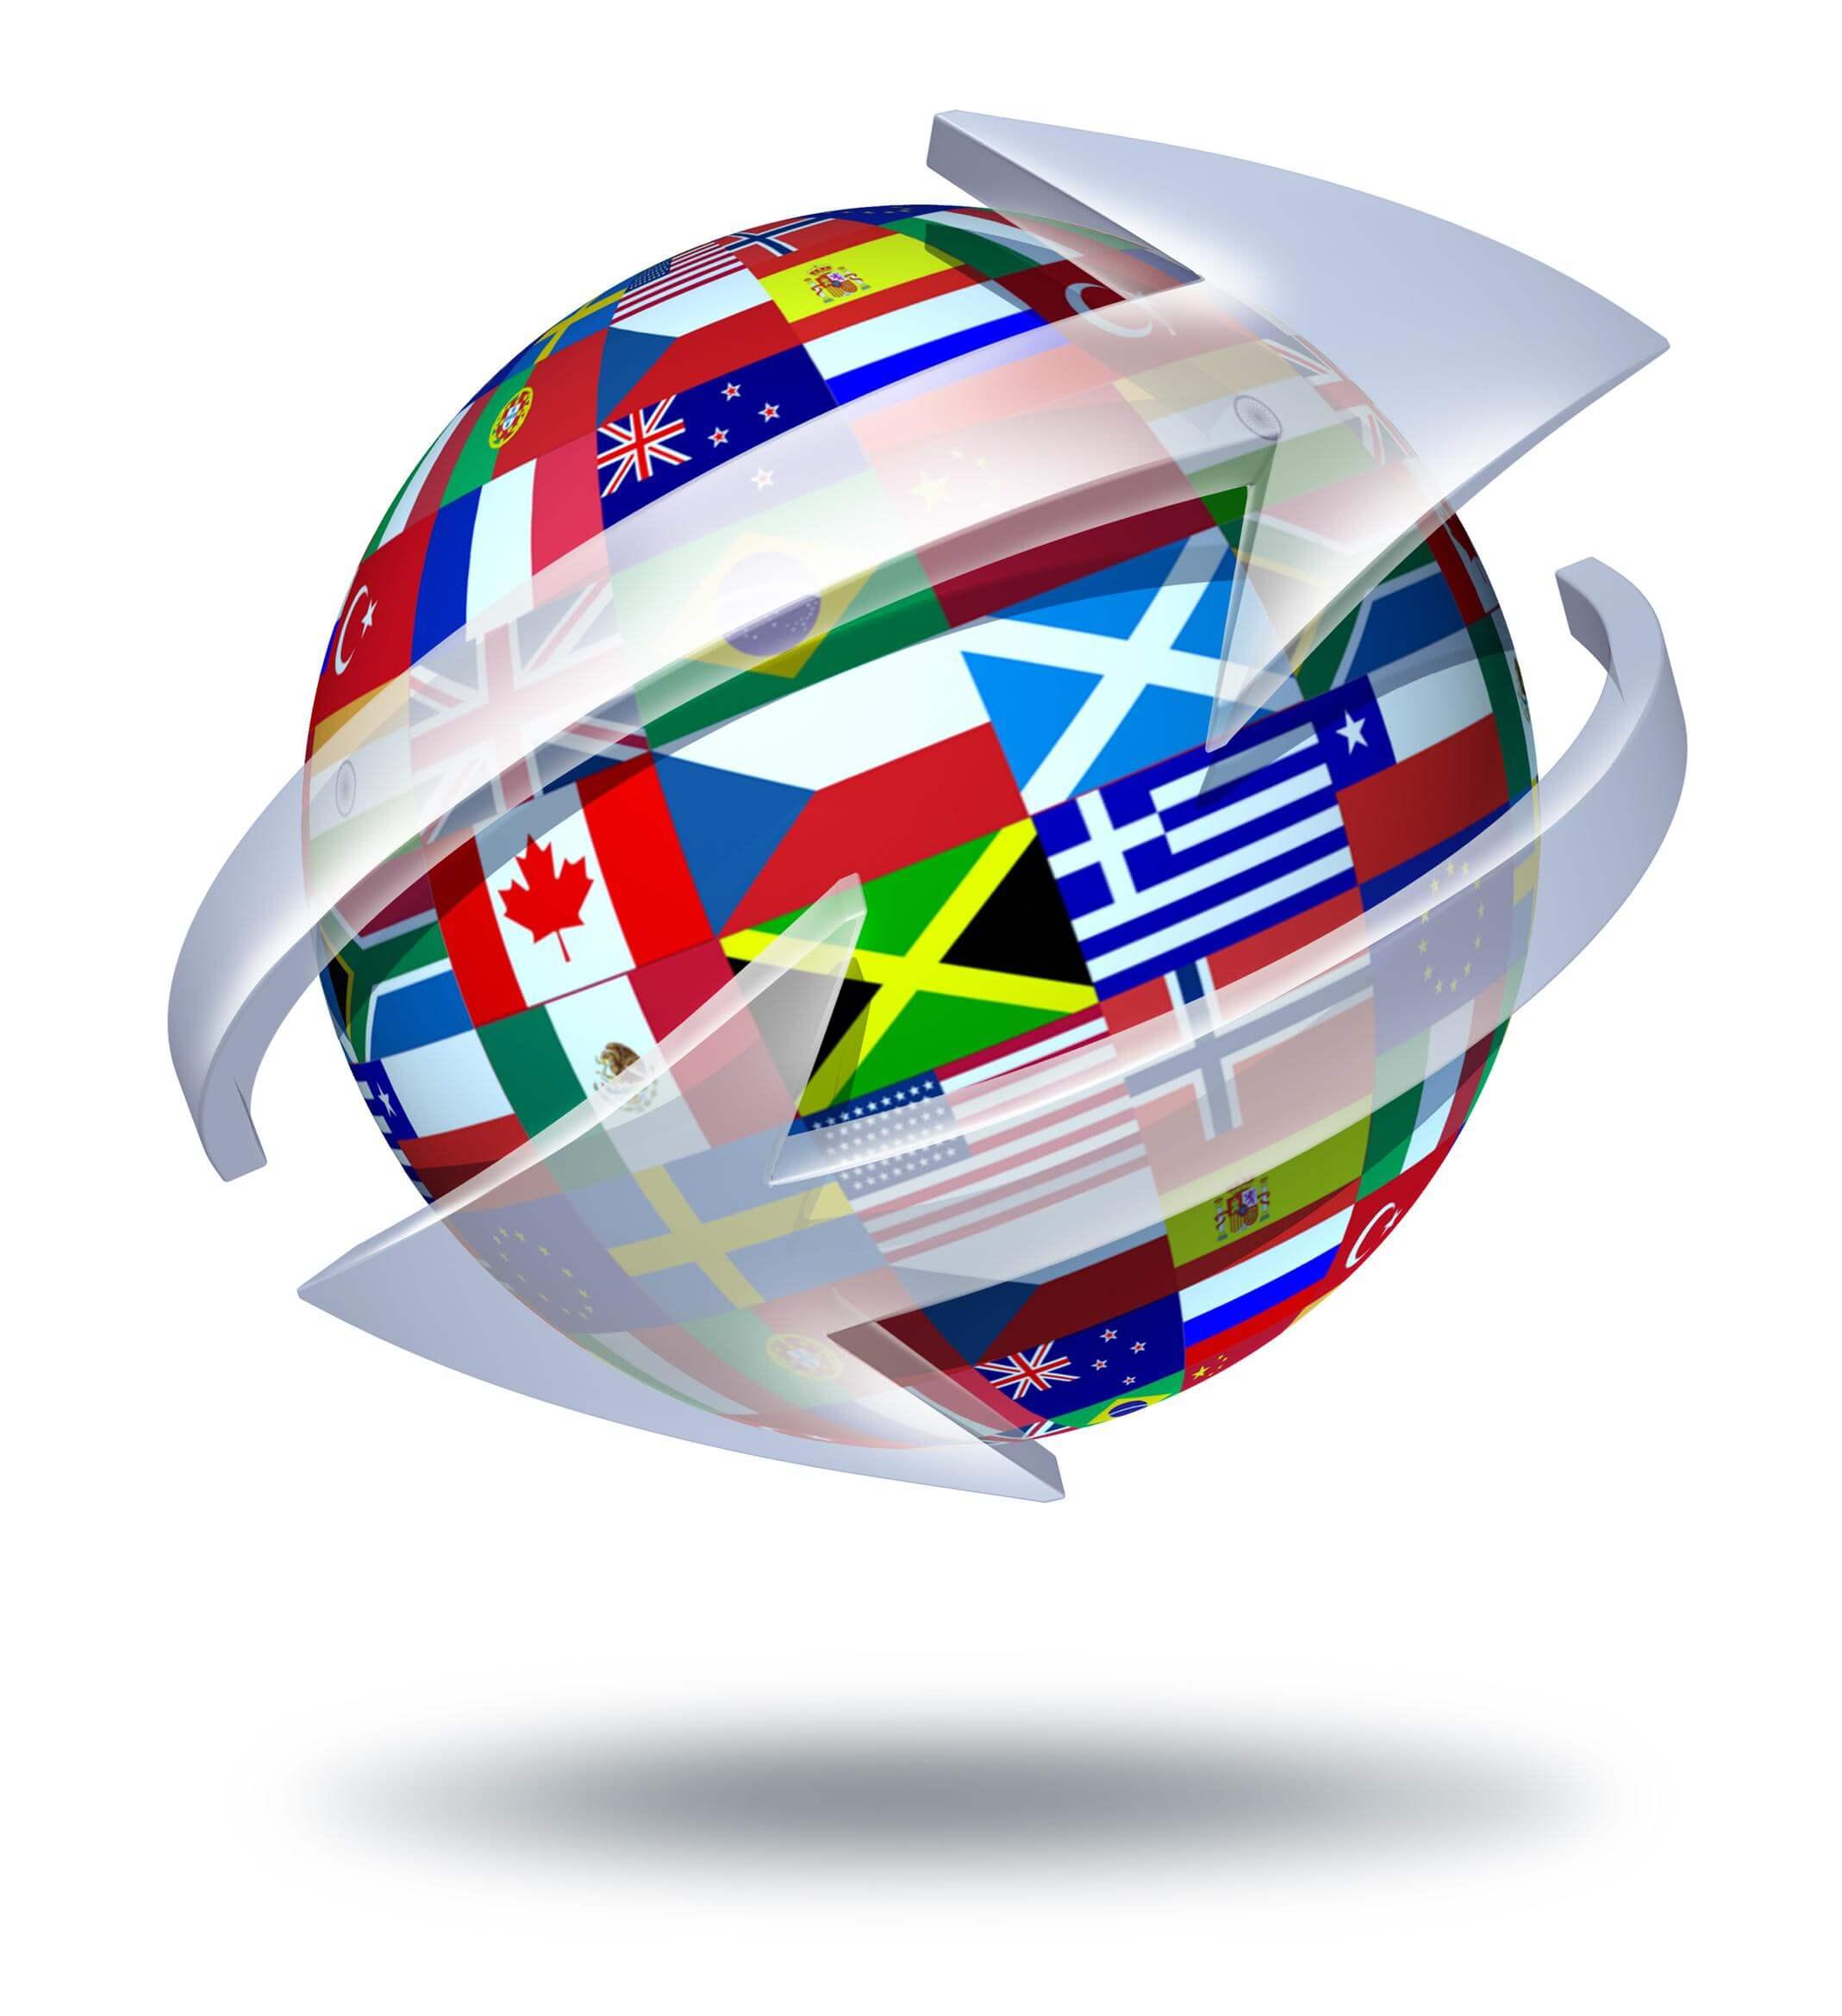 aop1-2 ויזה לישראל עבור אזרחי מדינות העולם